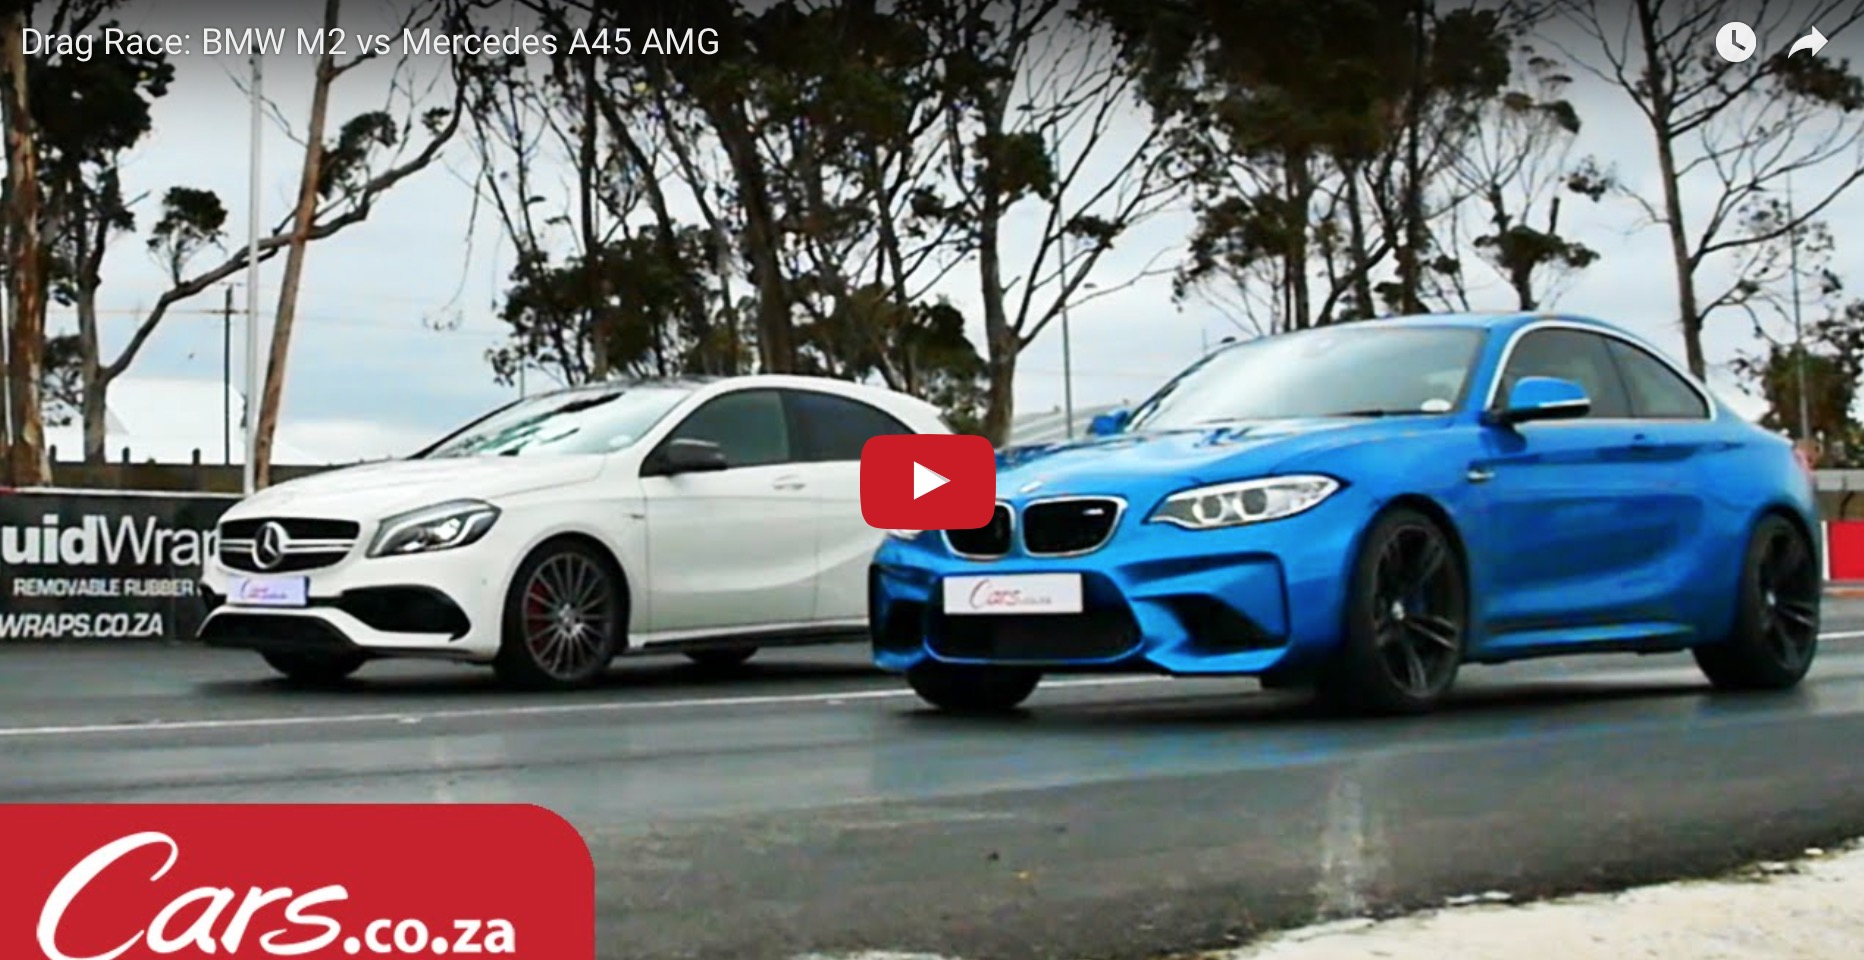 Drag Race: BMW M2 vs Mercedes A45 AMG